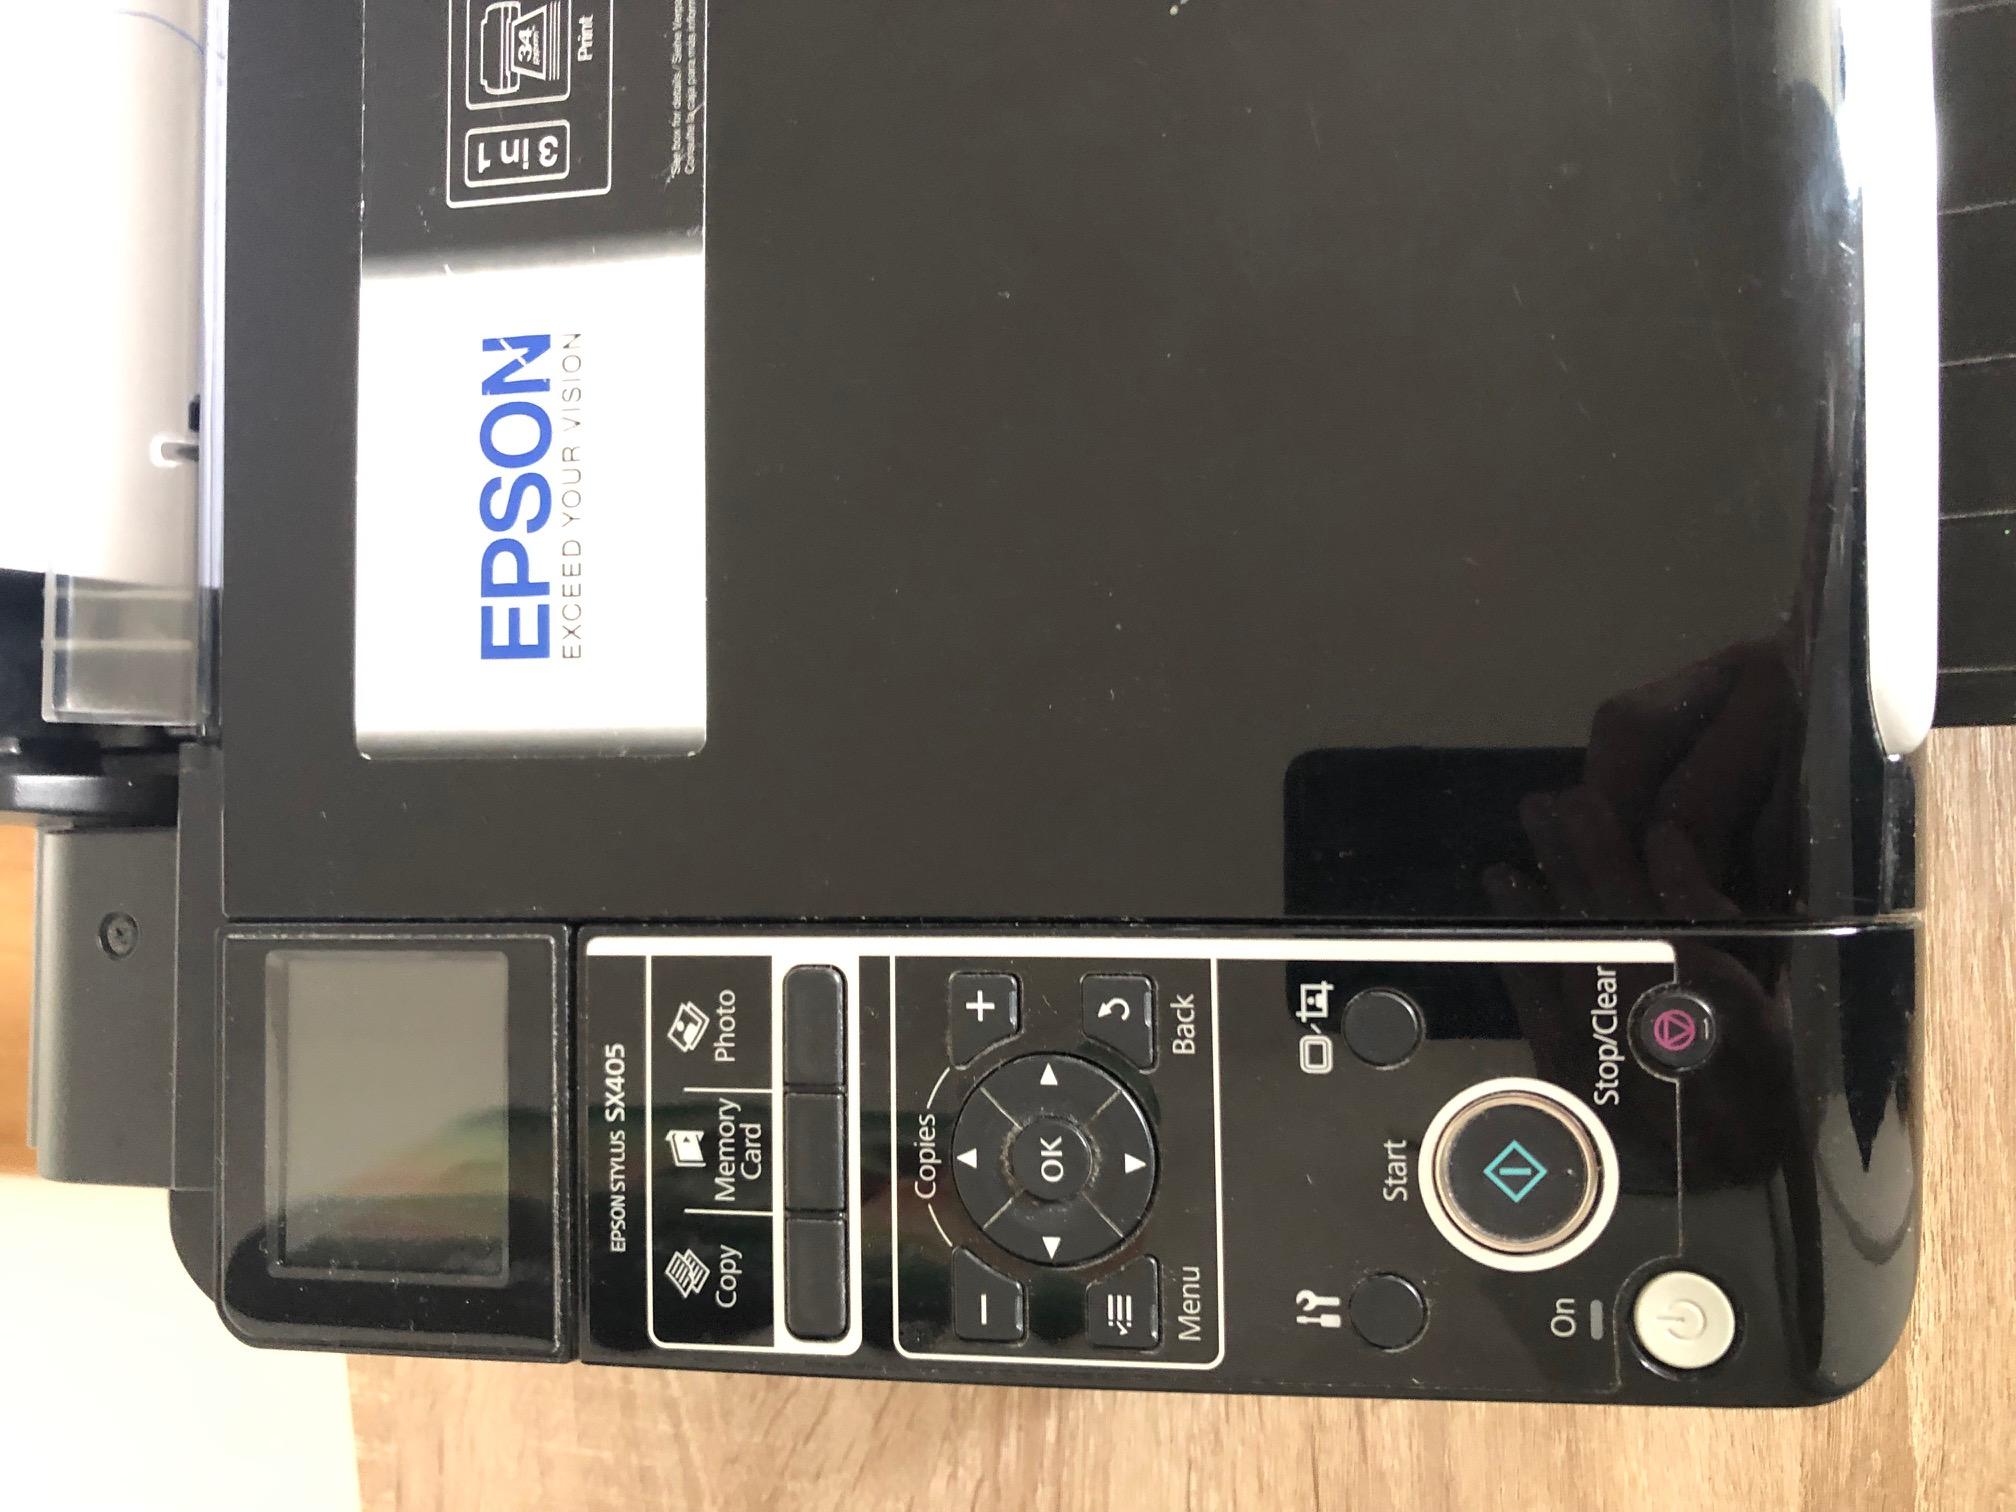 Imprimante Epson Stylus SX405